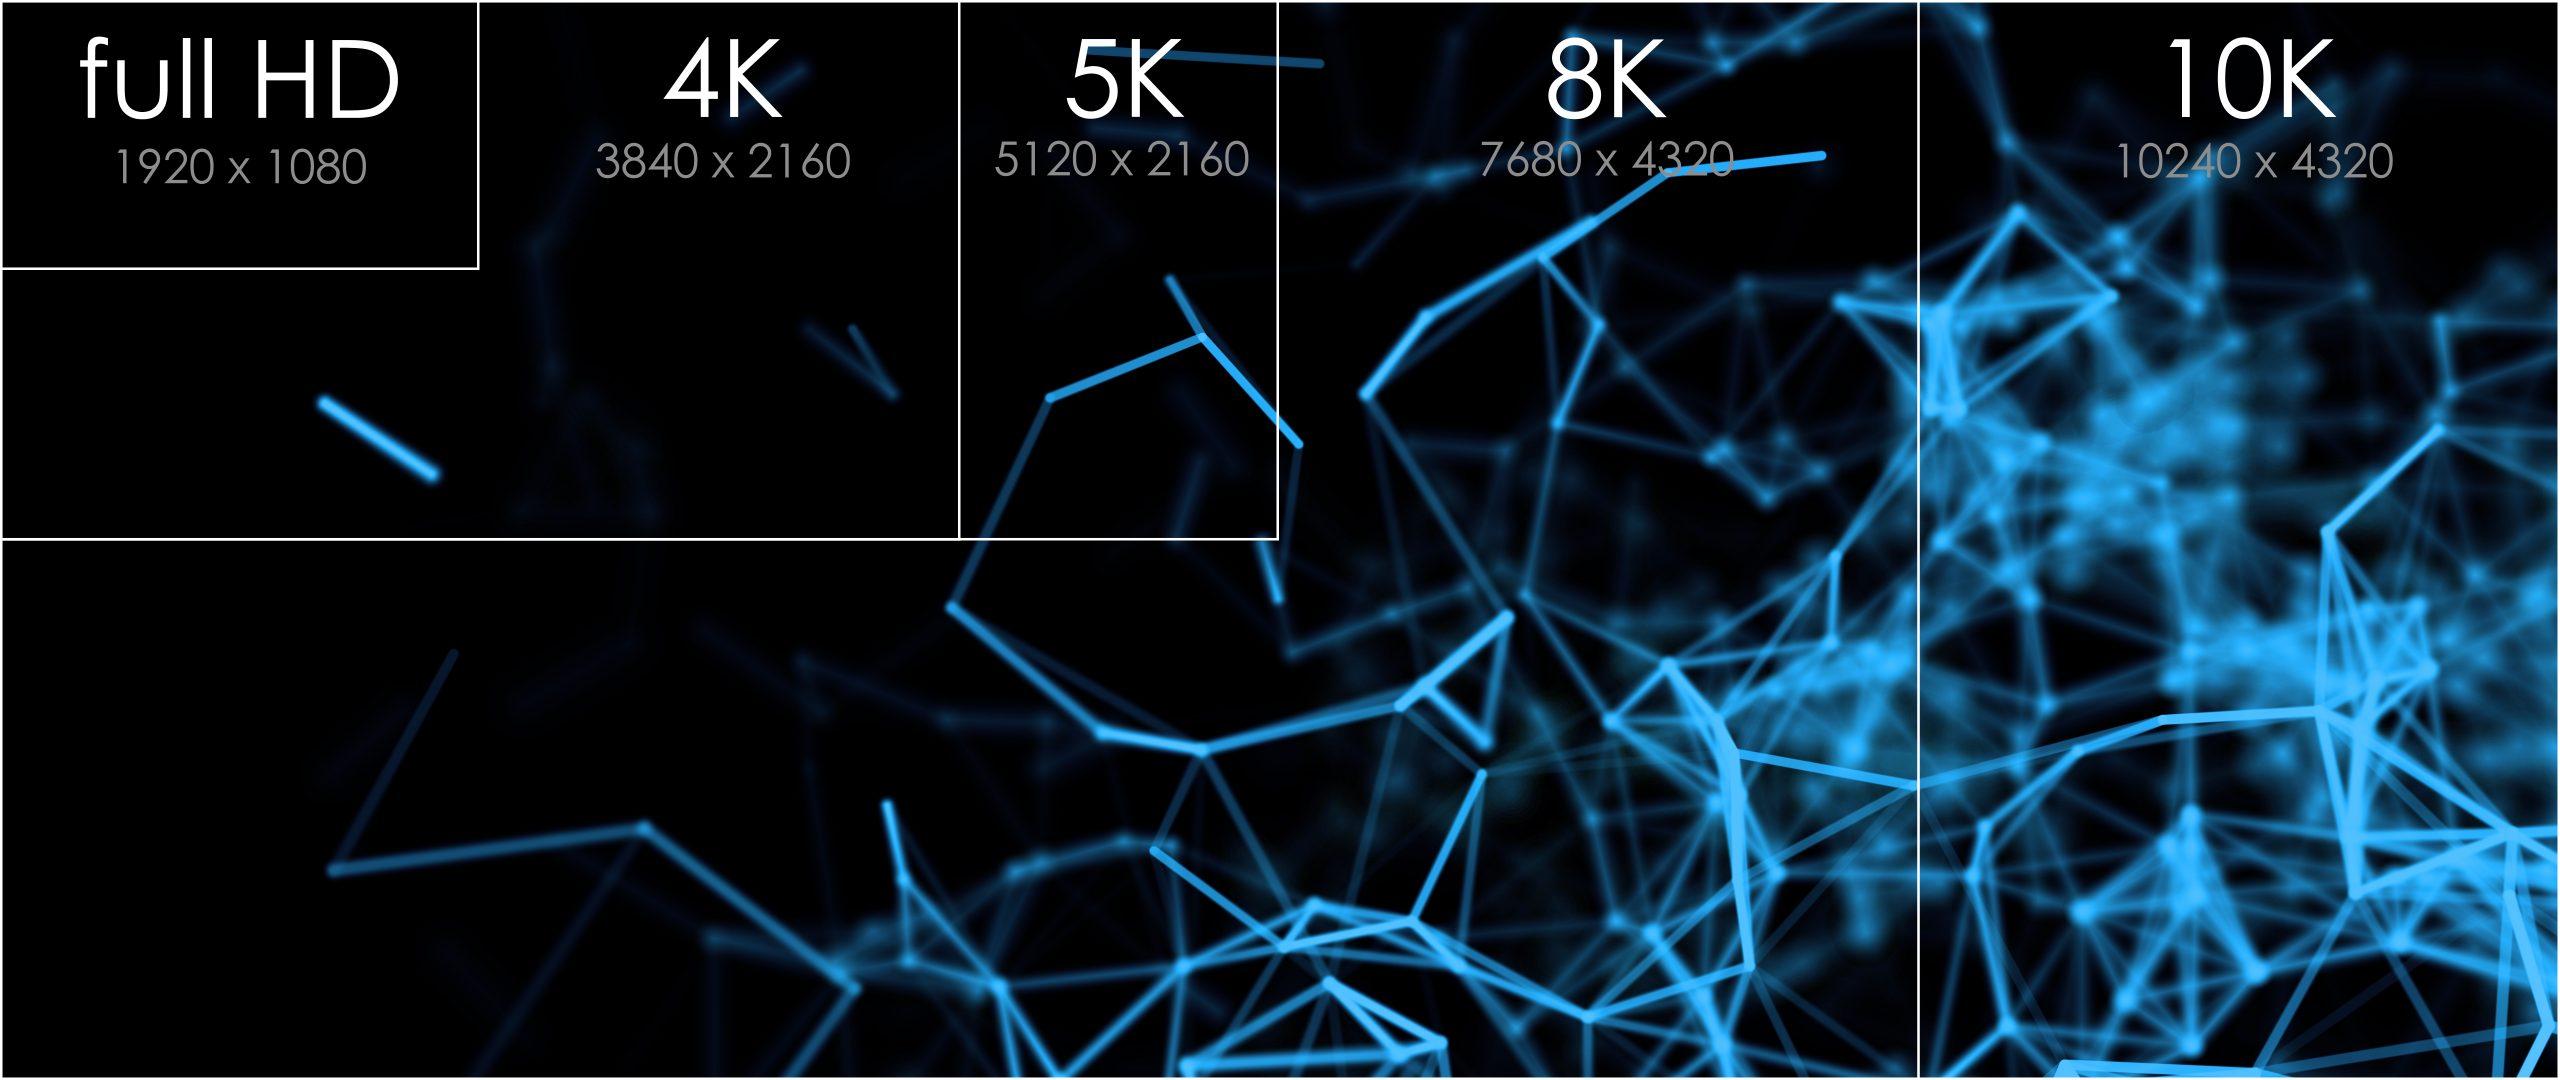 Ecran-TV-Hd-Full-Hd-4K-8K-faire-son-choix